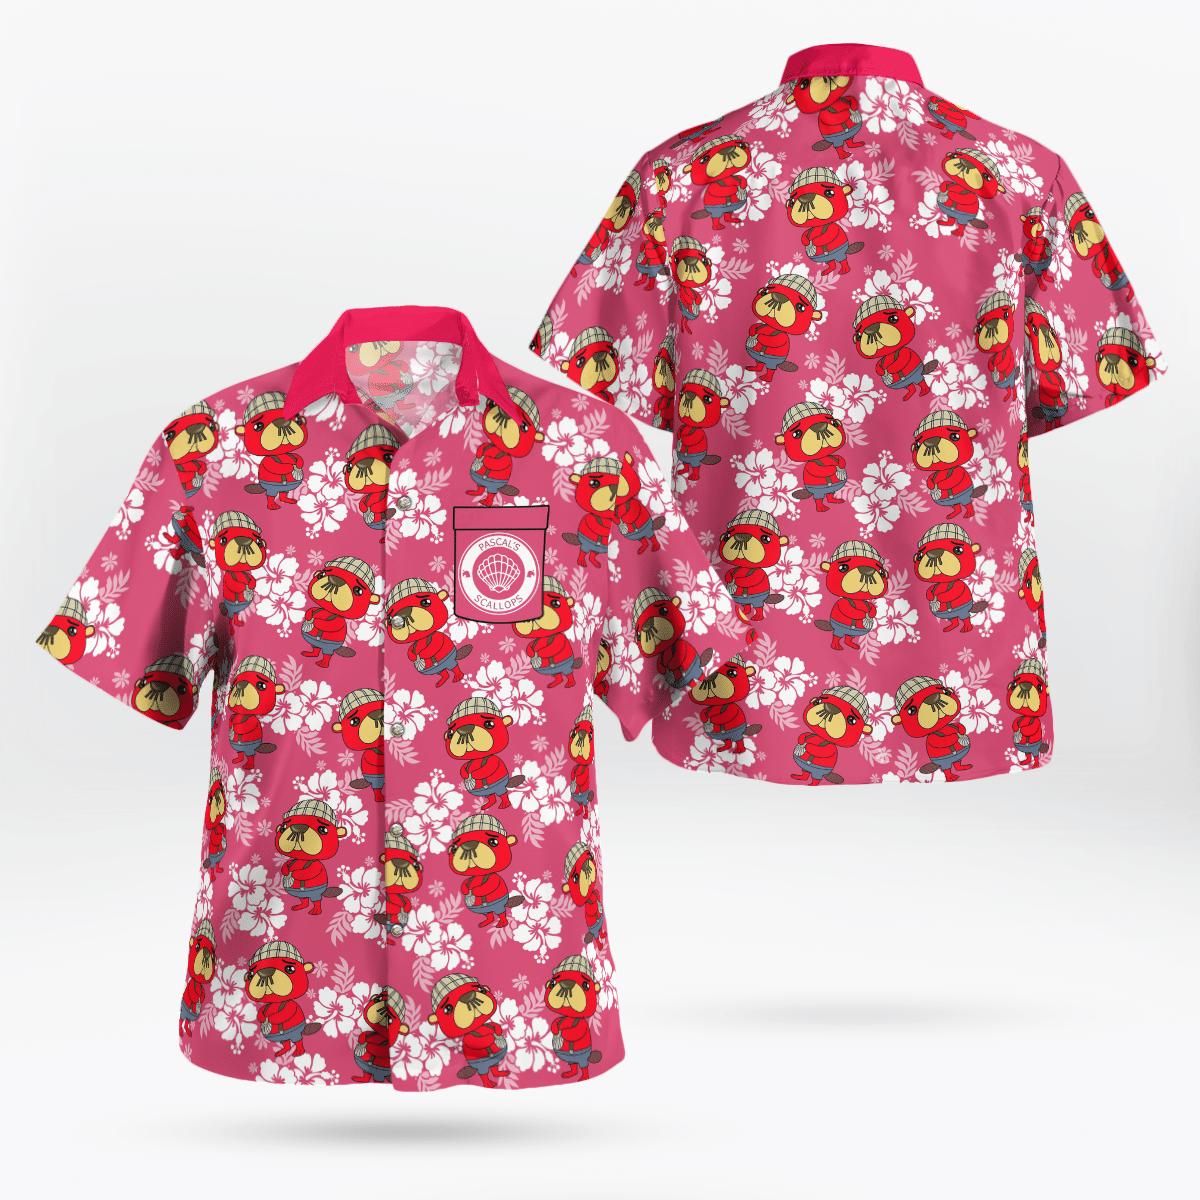 Pascal Scallop Hawaiian shirt